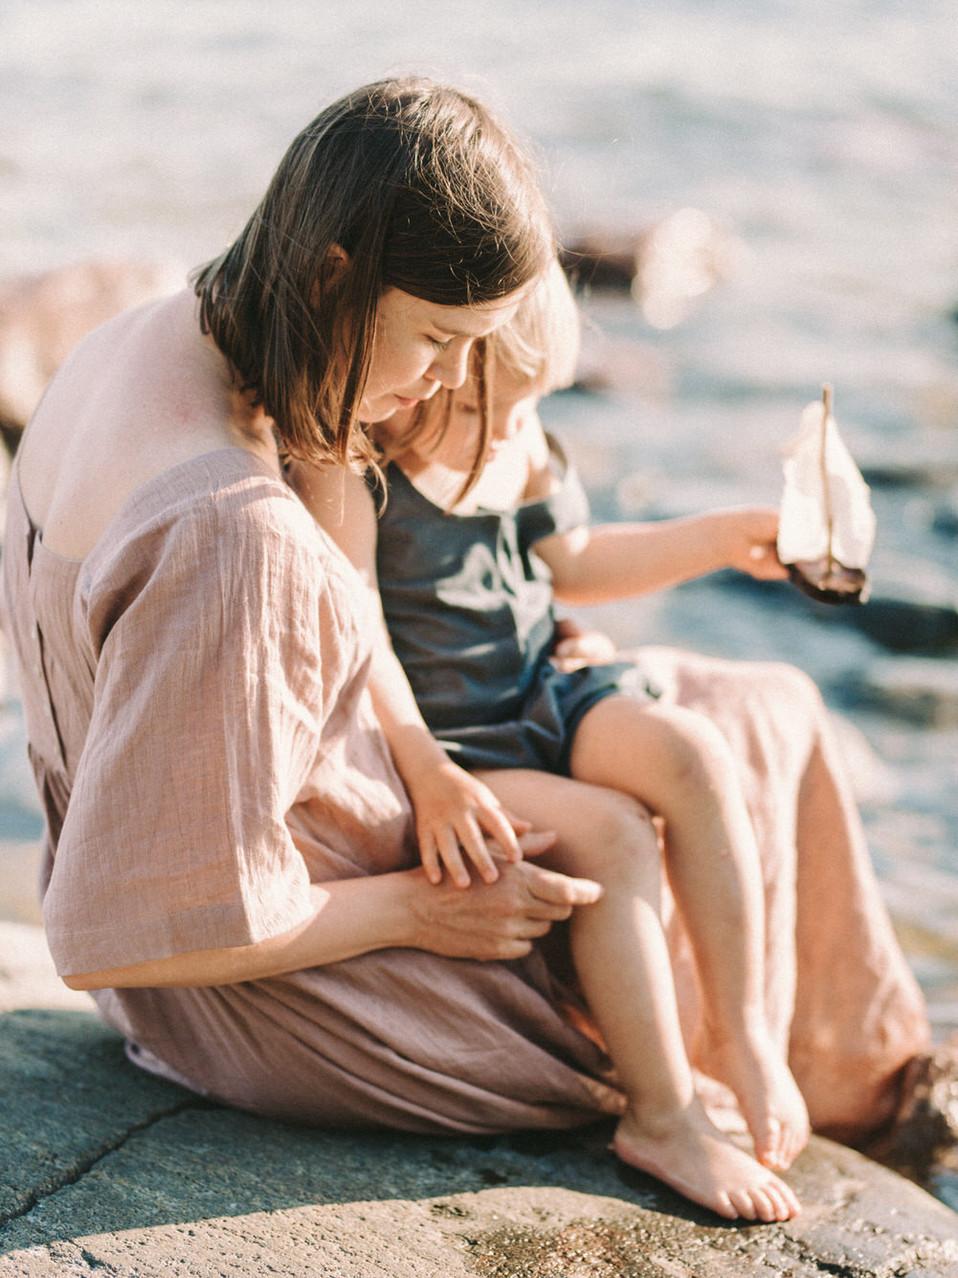 Perhe Huiskonen, Nord Stories, Susanna N